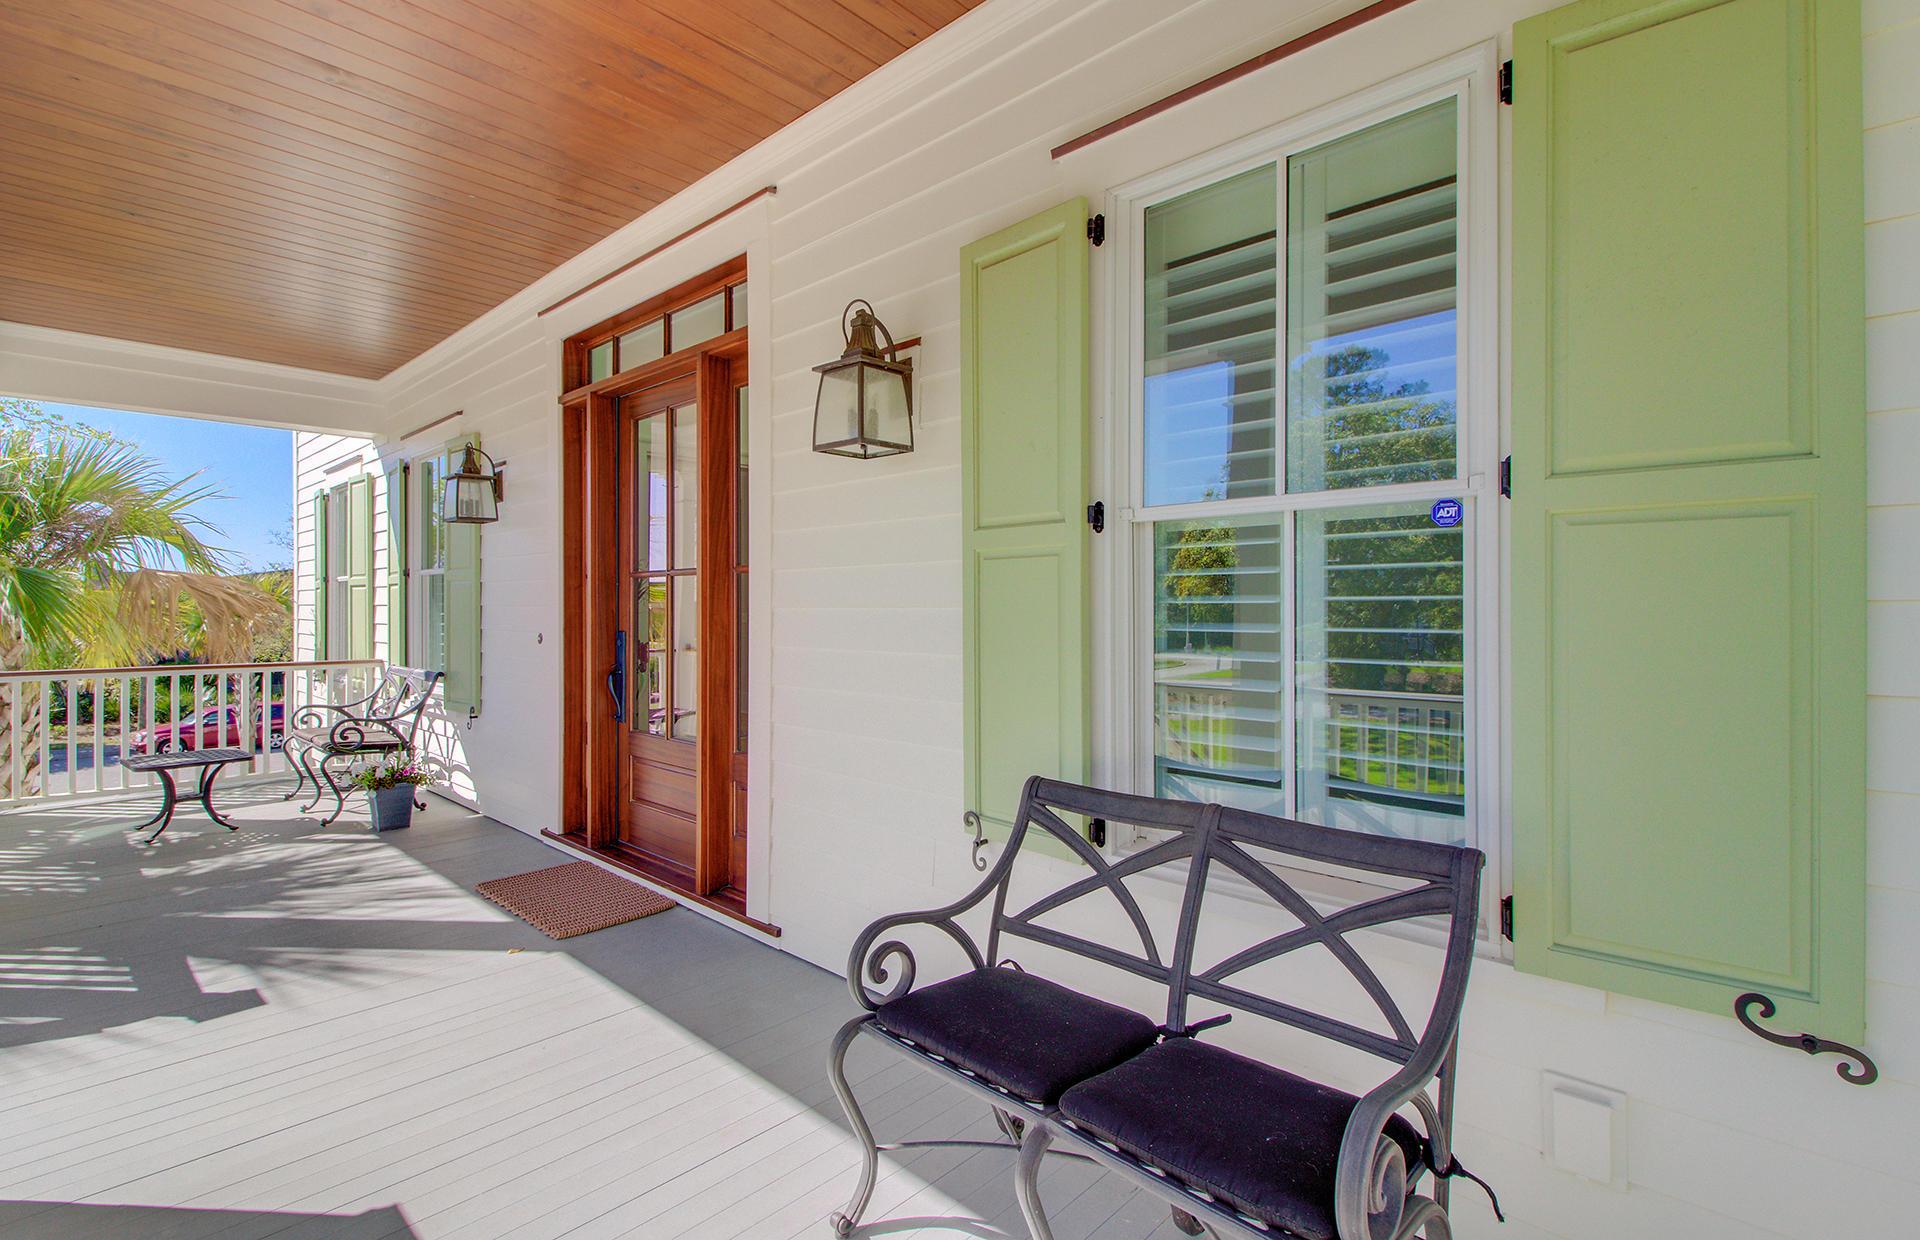 Beresford Hall Homes For Sale - 253 Grand Park, Charleston, SC - 15